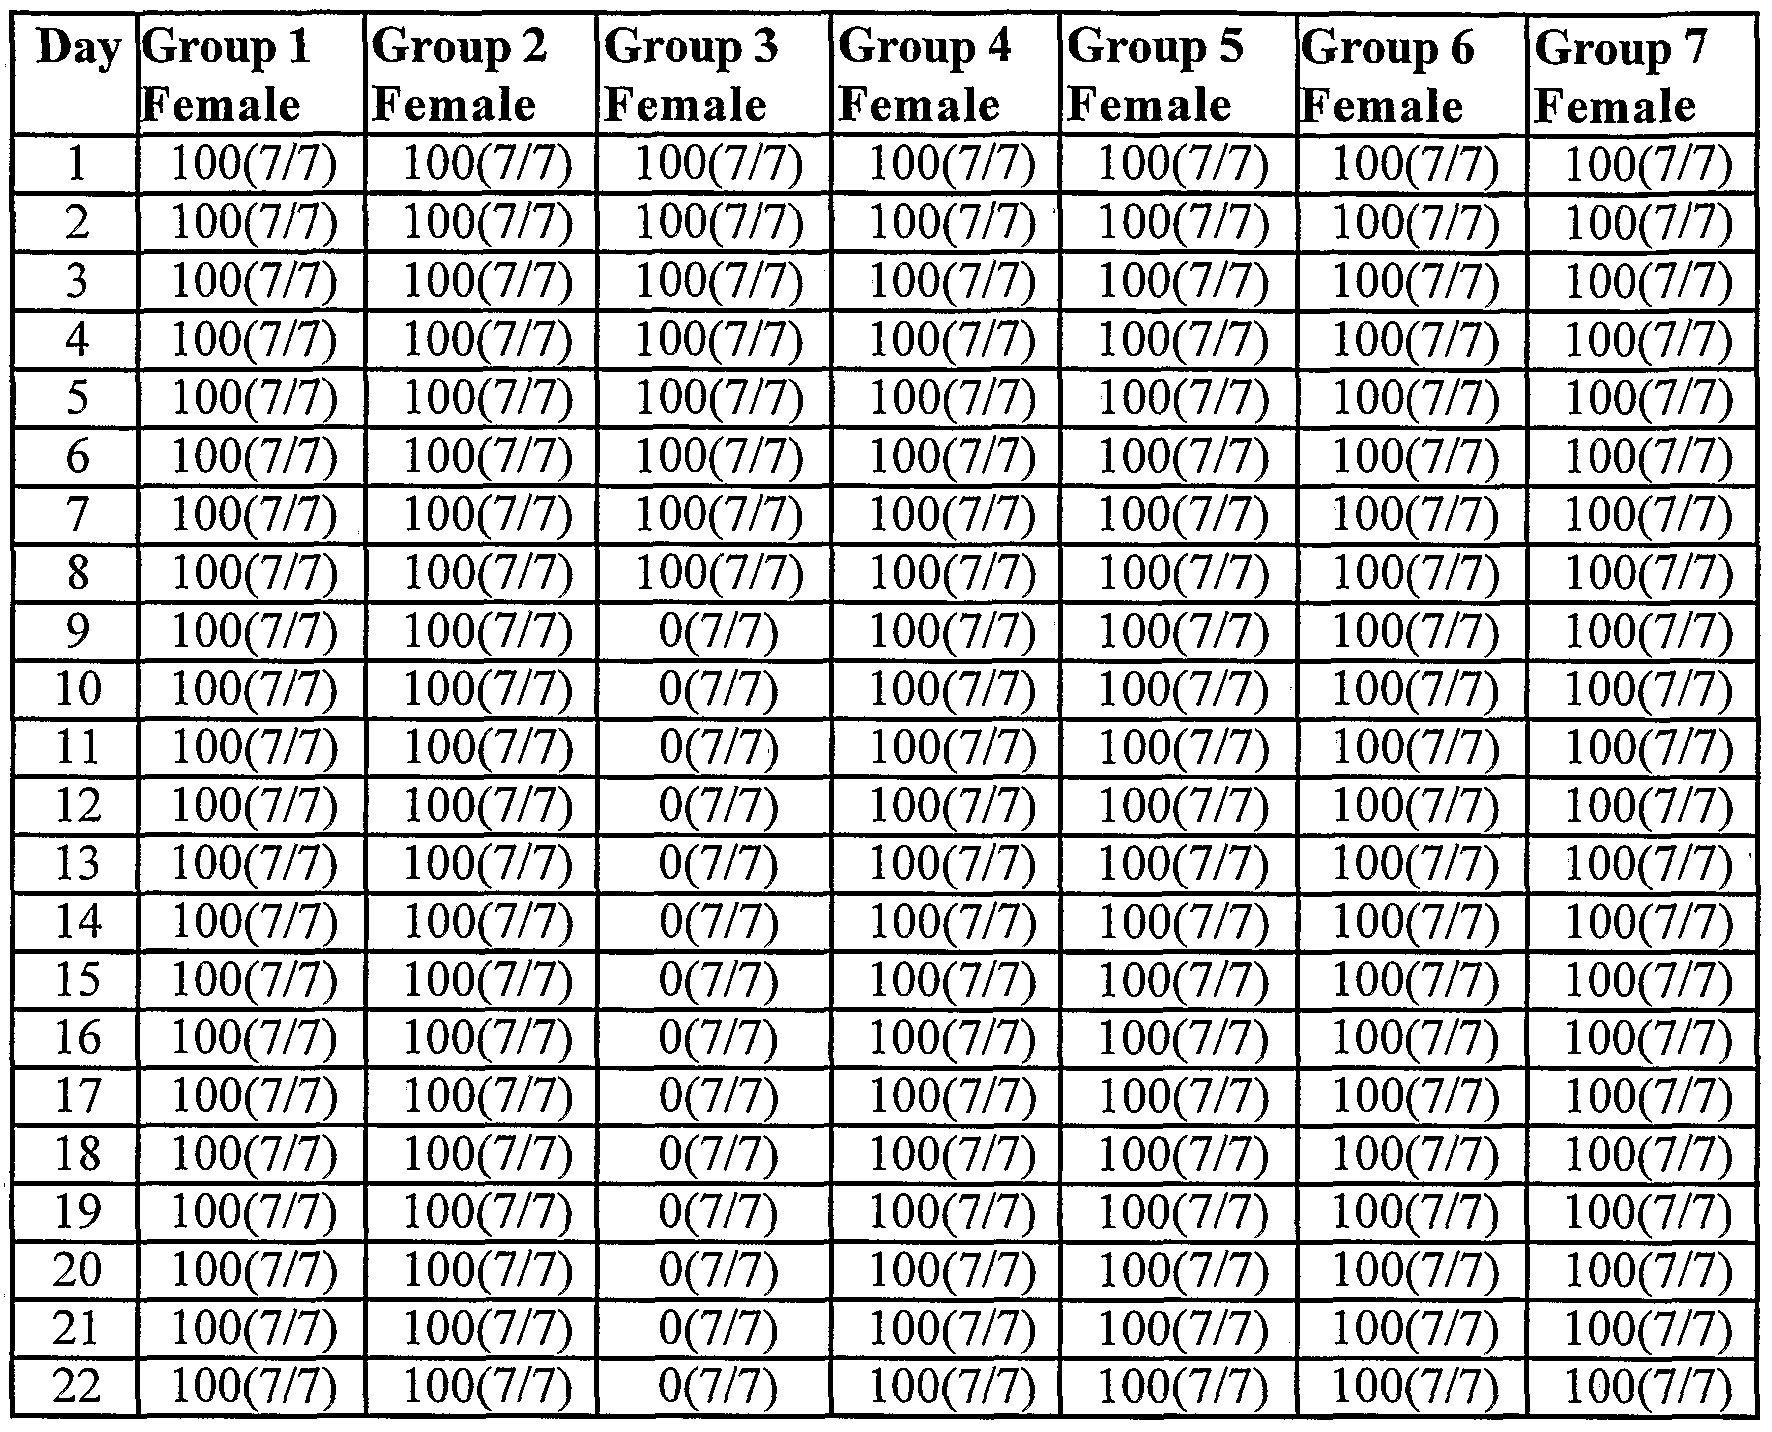 28 Day Multi Dose Calendar | Printable Calendar Template 2020 Multi Vial 28 Day Calendar